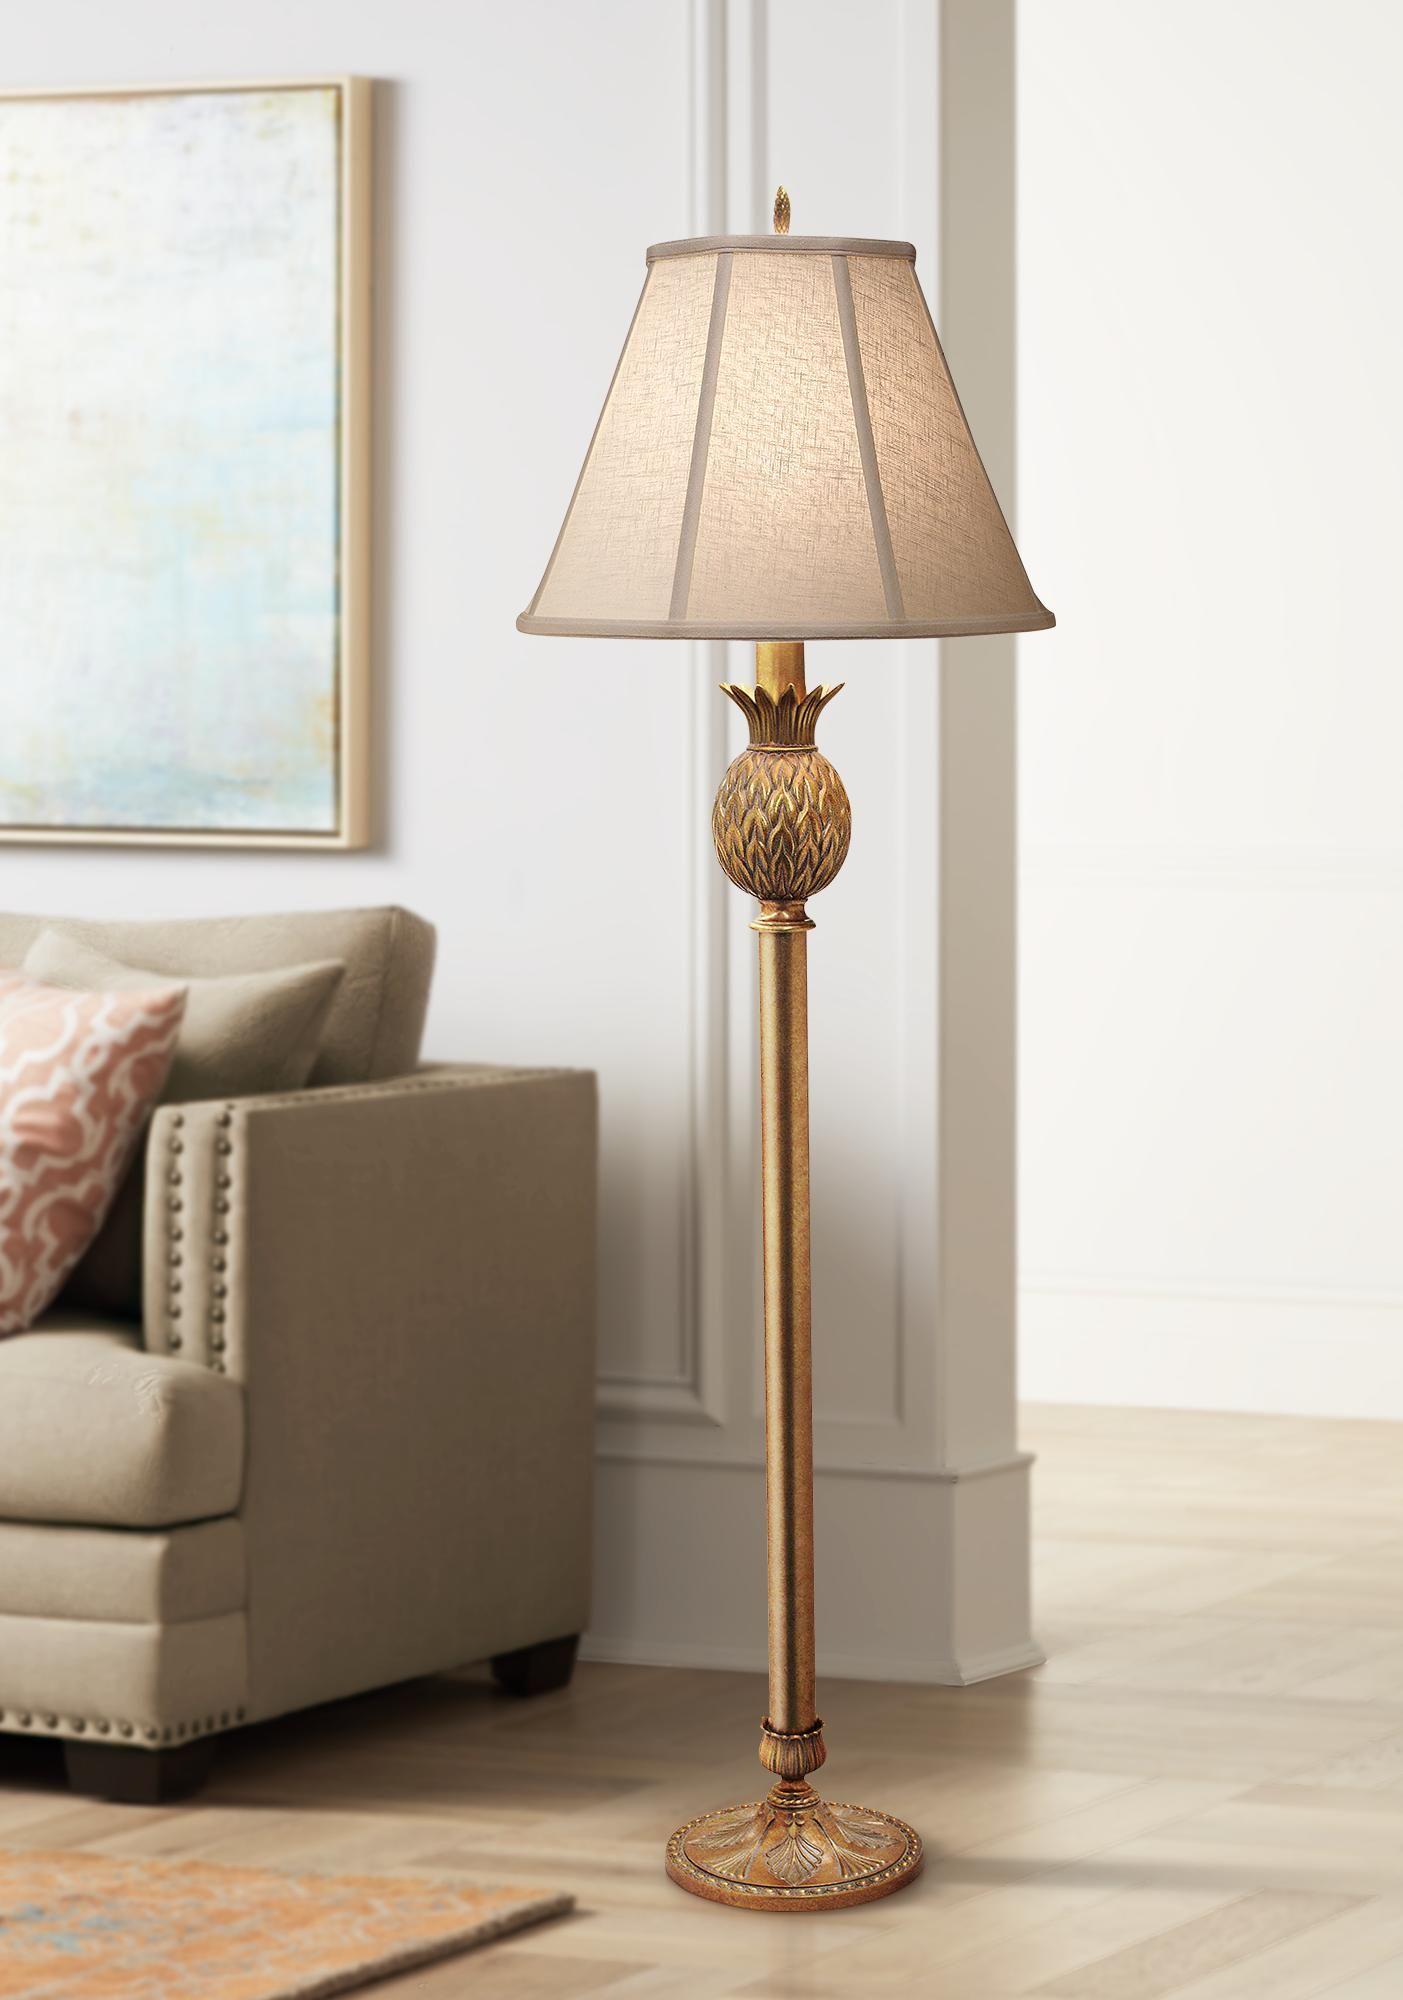 Floor Lamps Stiffel Lanai Polished Honey Brass Floor Lamp In 2020 Brass Floor Lamp Floor Lamp Traditional Floor Lamps